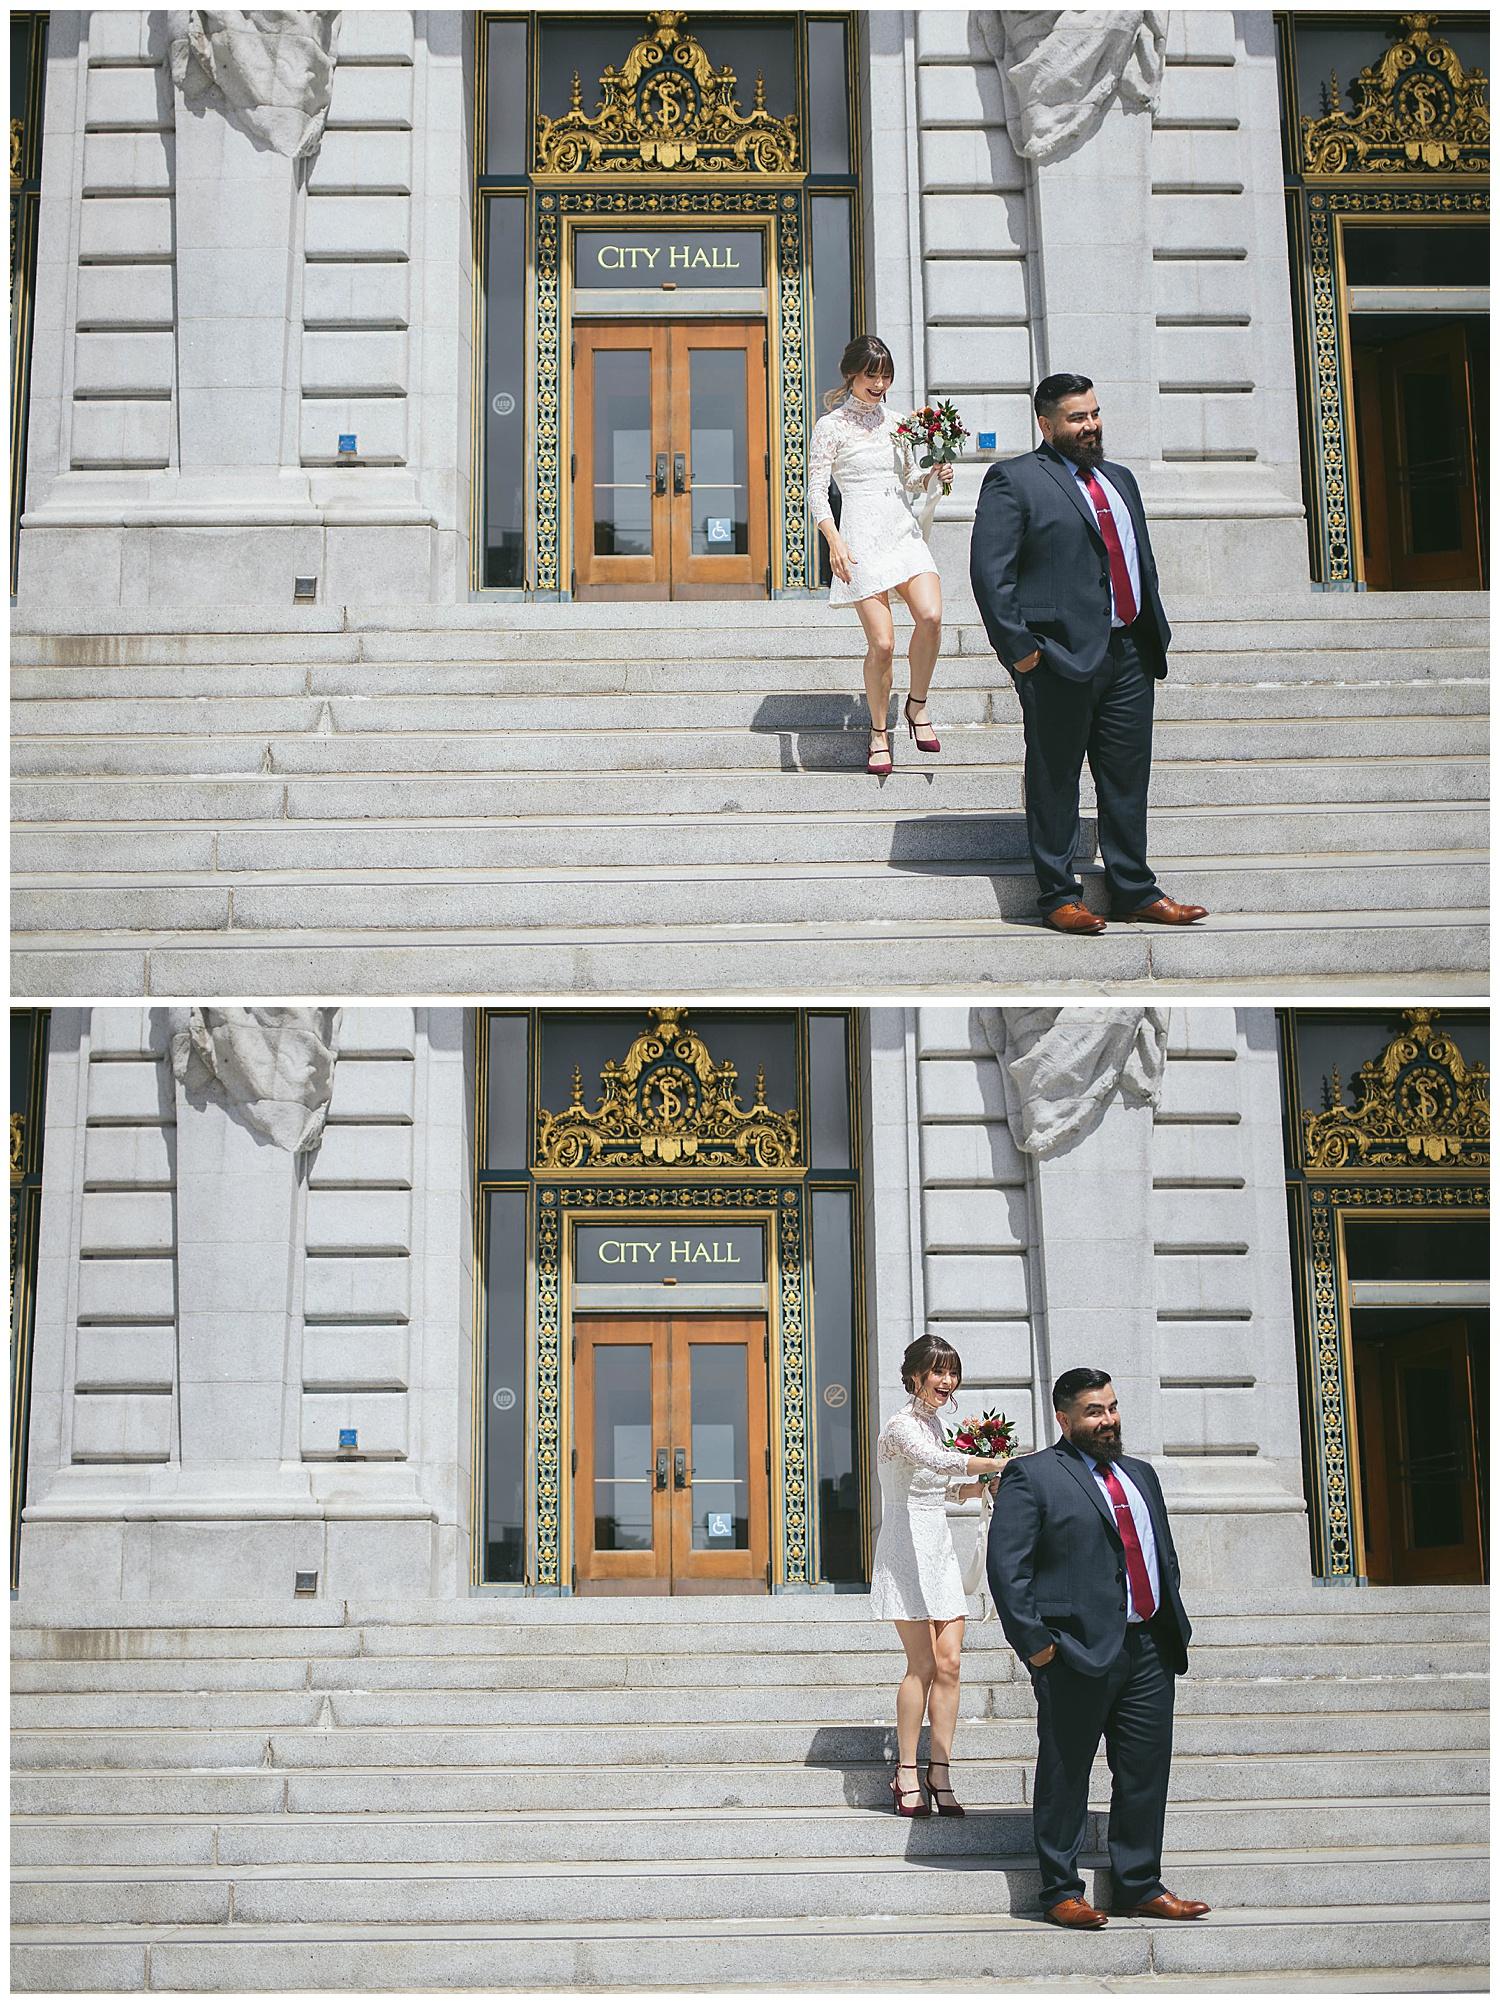 khariza-rae-photography-bay-area-wedding-photographer_0022.jpg